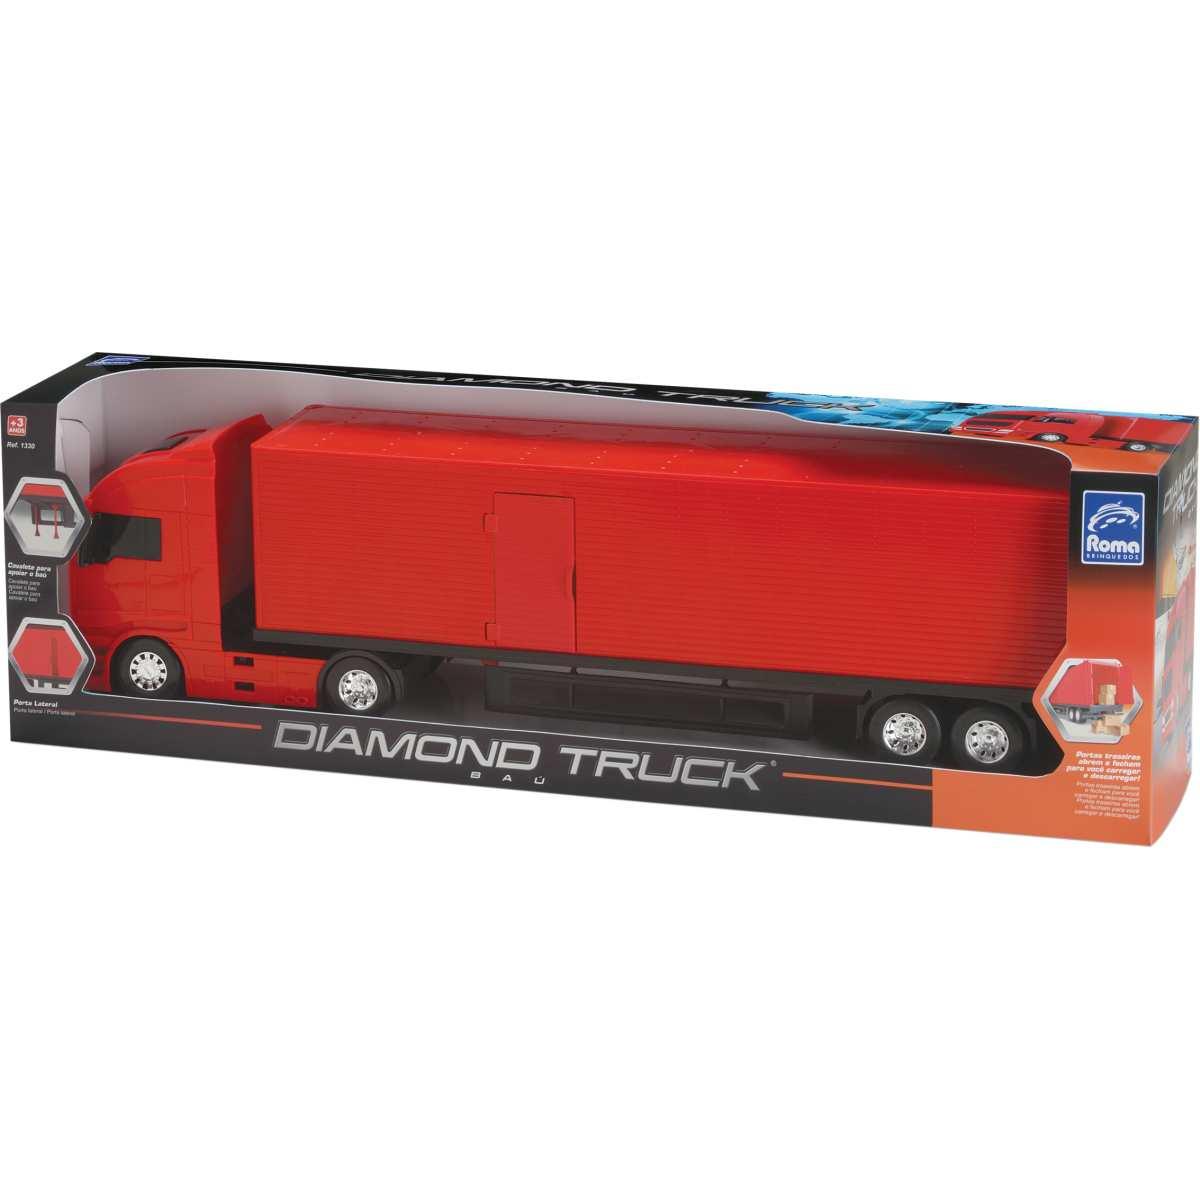 Caminhao | Diamond Truck Bau 67cm | Roma